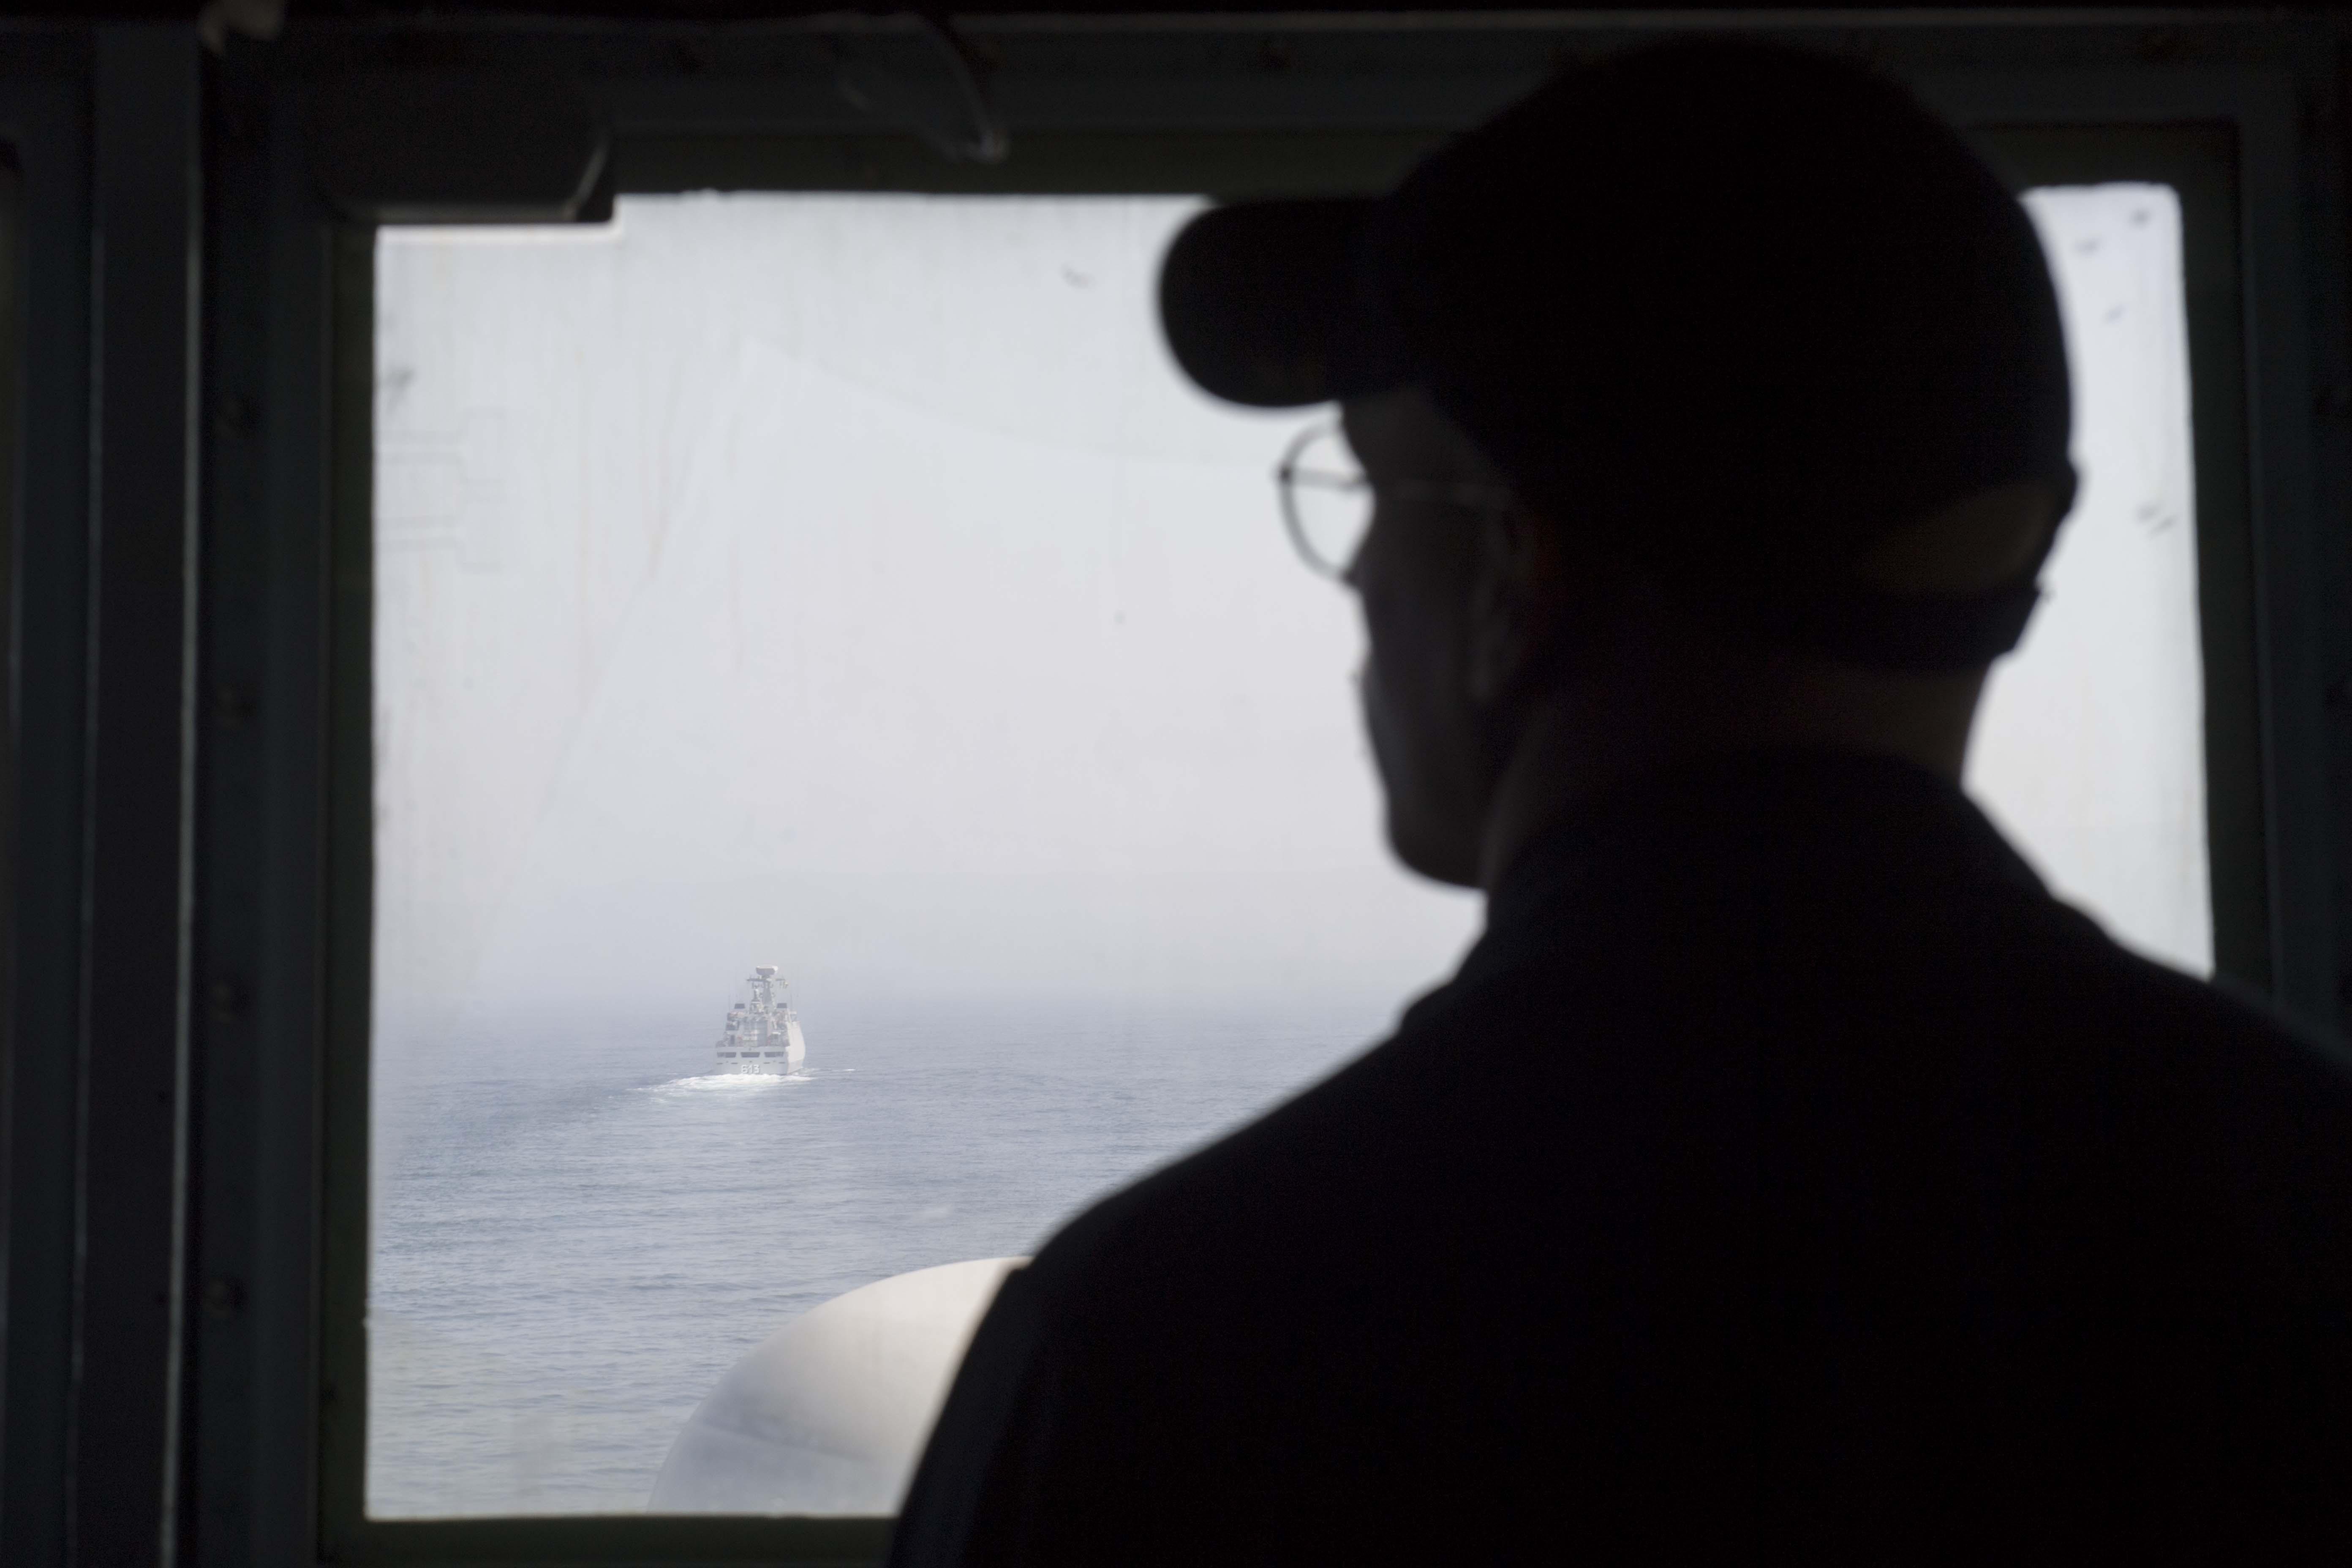 PASSEX 18 - USS ROSS (DDG71) et RMN Tarik Ben Ziyad (613) 30179460918_419c42f1fa_o